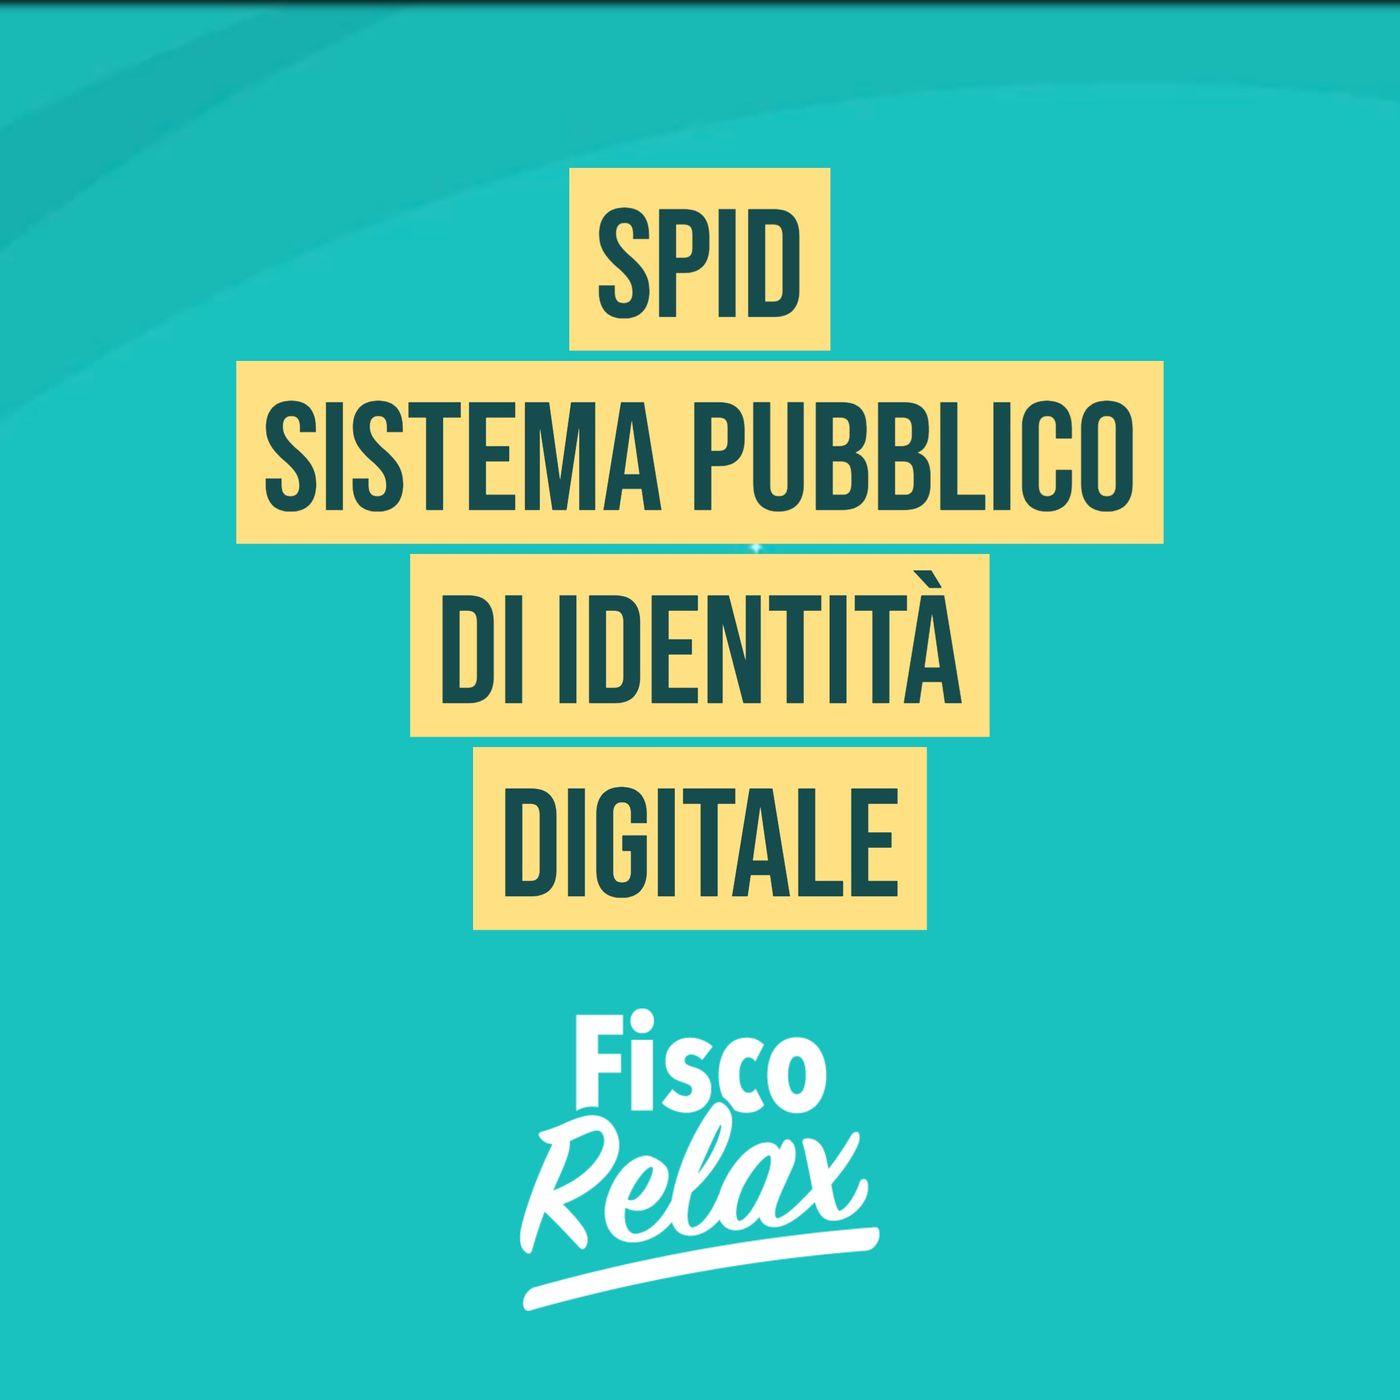 SPID – SISTEMA PUBBLICO DI IDENTITA' DIGITALE